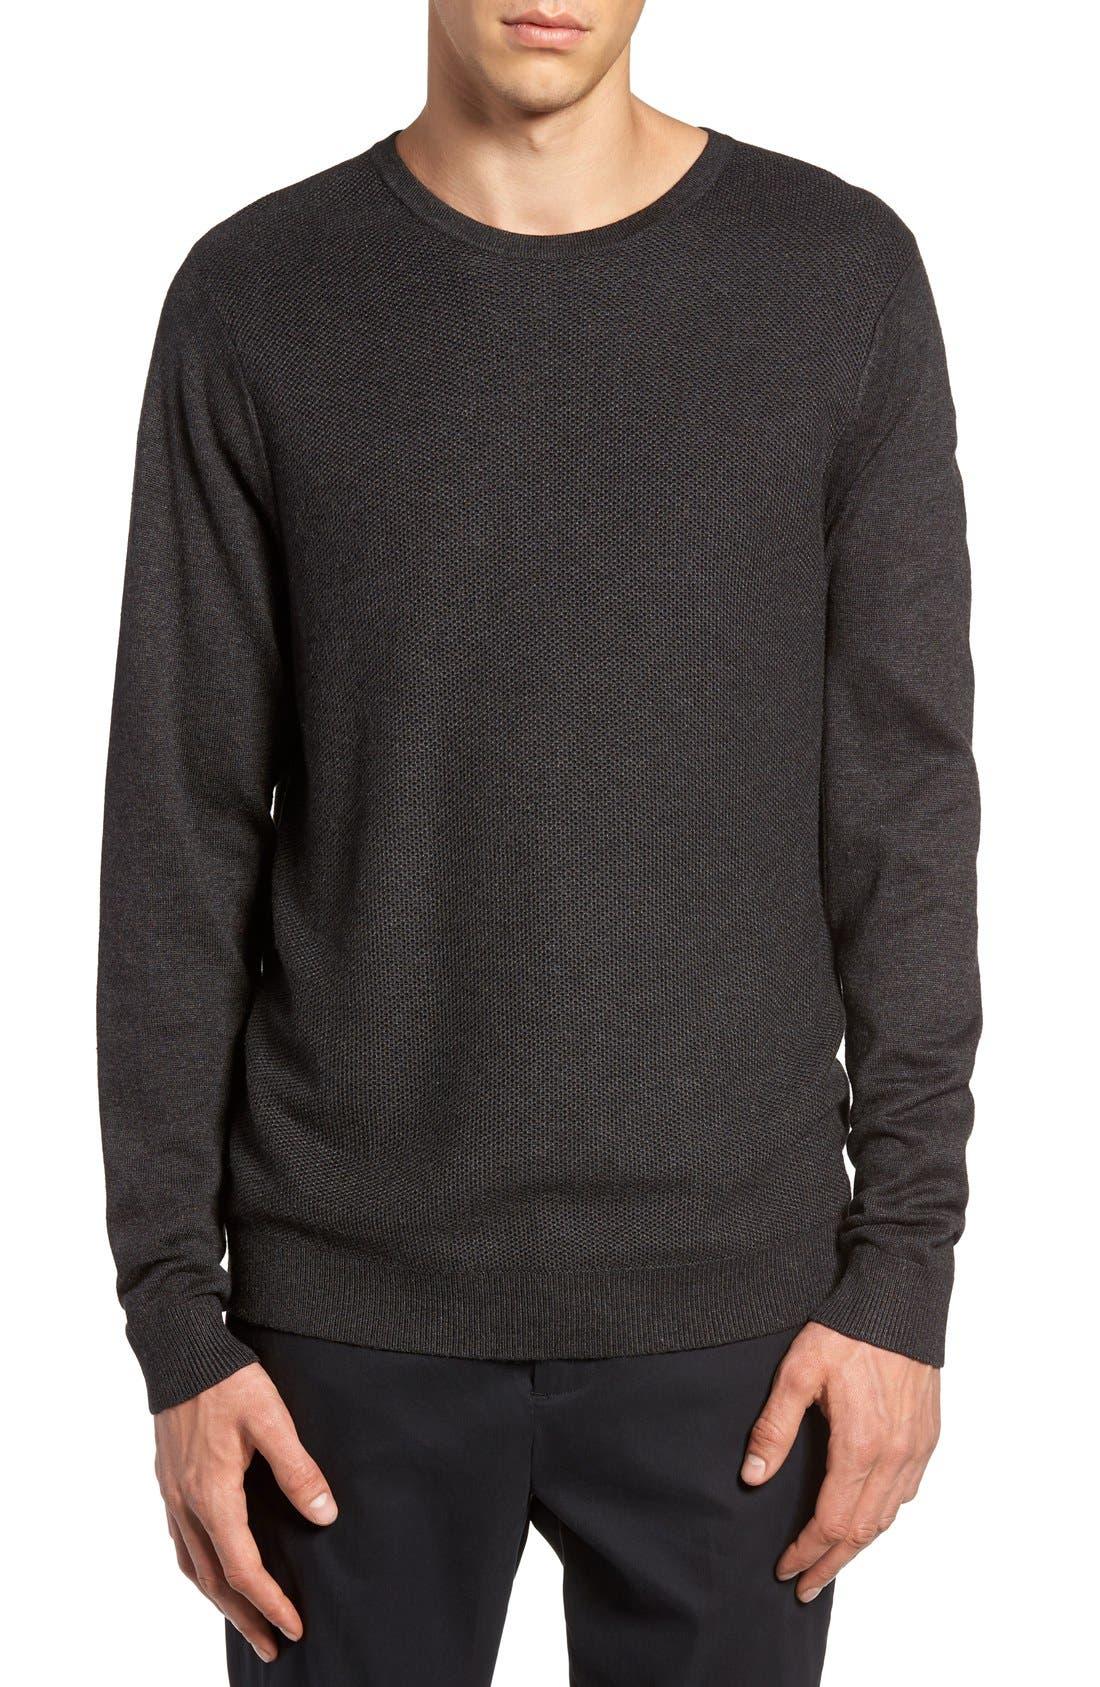 Calibrate Honeycomb Stitch Crewneck Sweater